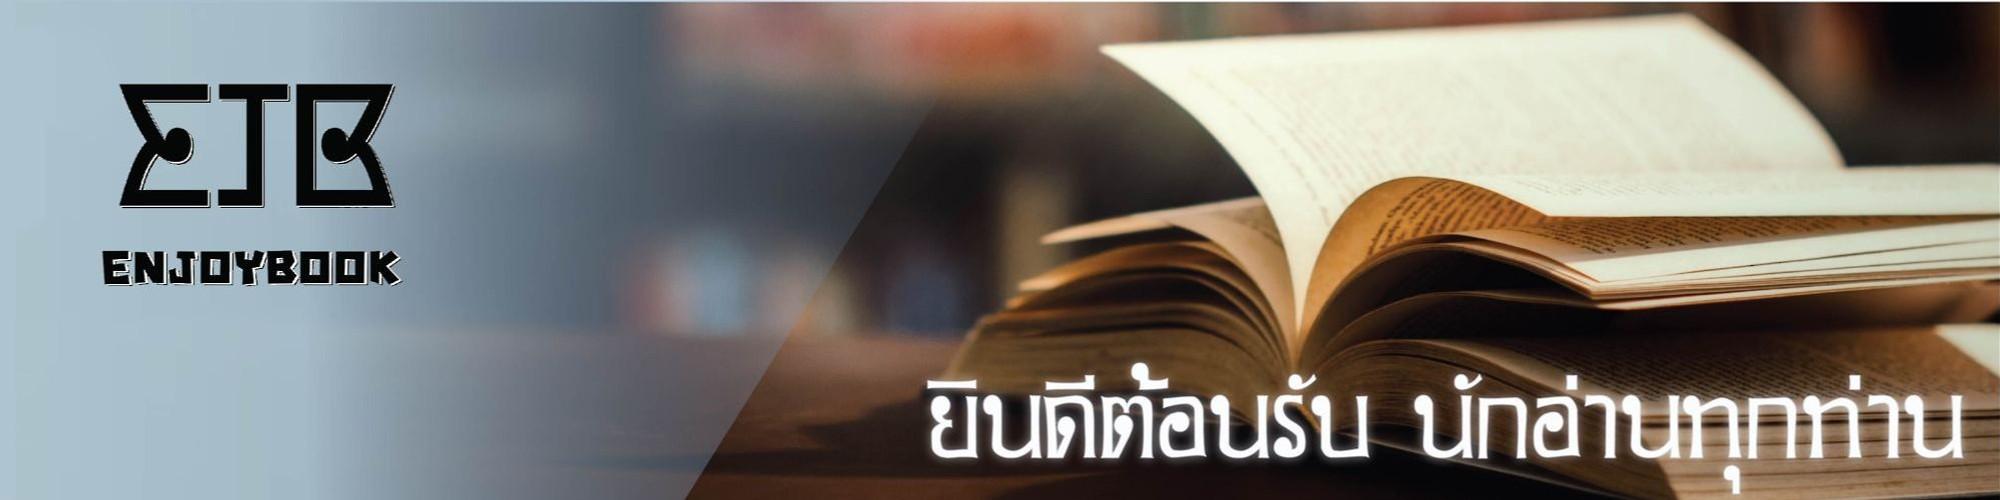 pb-enjoyBook-cover